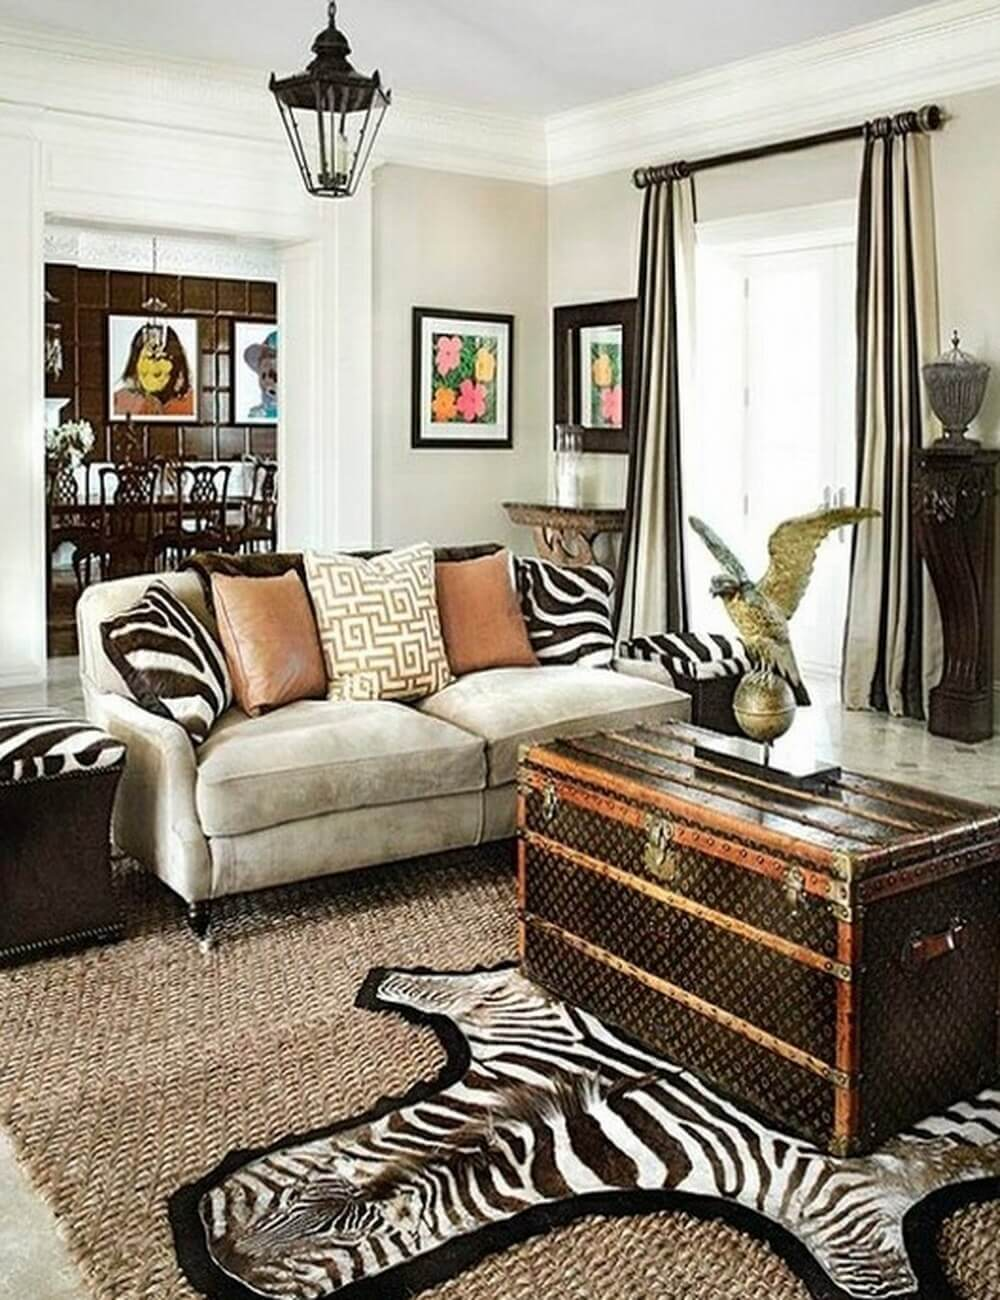 10 Fierce Interior Design Ideas With Zebra Print Accent